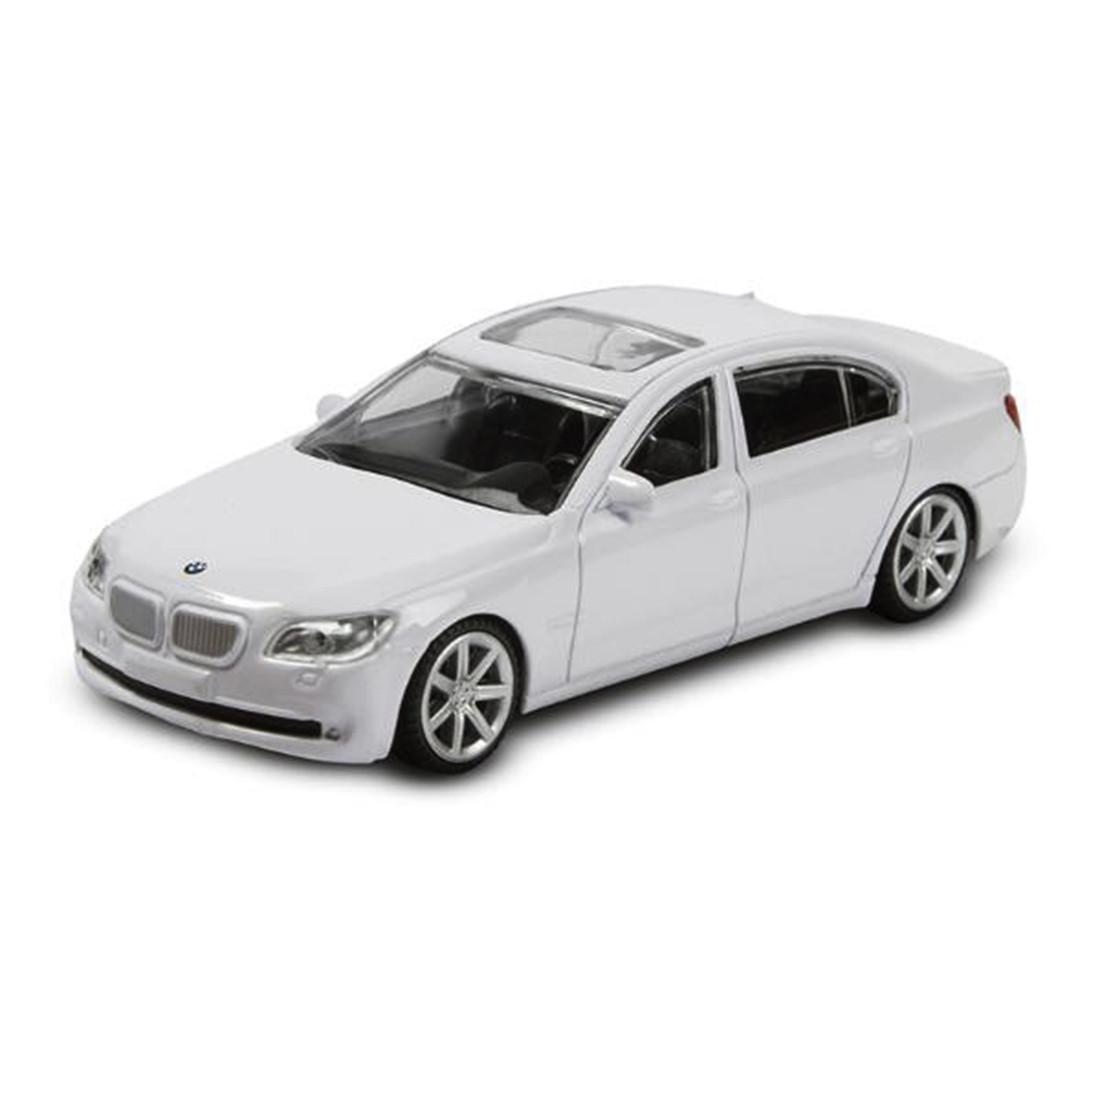 Металлическая машинка RASTAR 37600W BMW 7 Series (11,5 см, White)